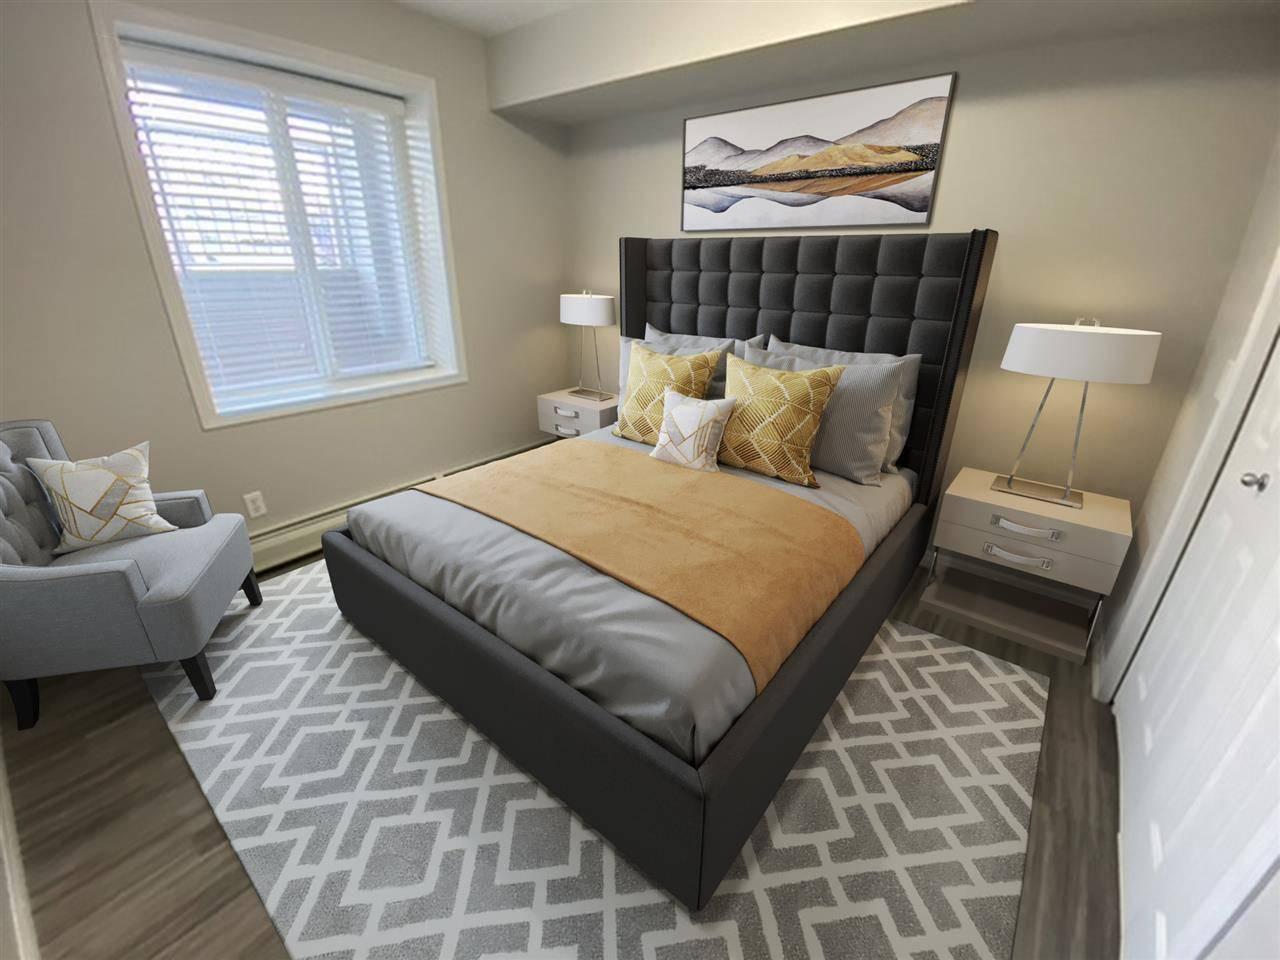 Condo for sale at 40 Summerwood Blvd Unit 105 Sherwood Park Alberta - MLS: E4194577